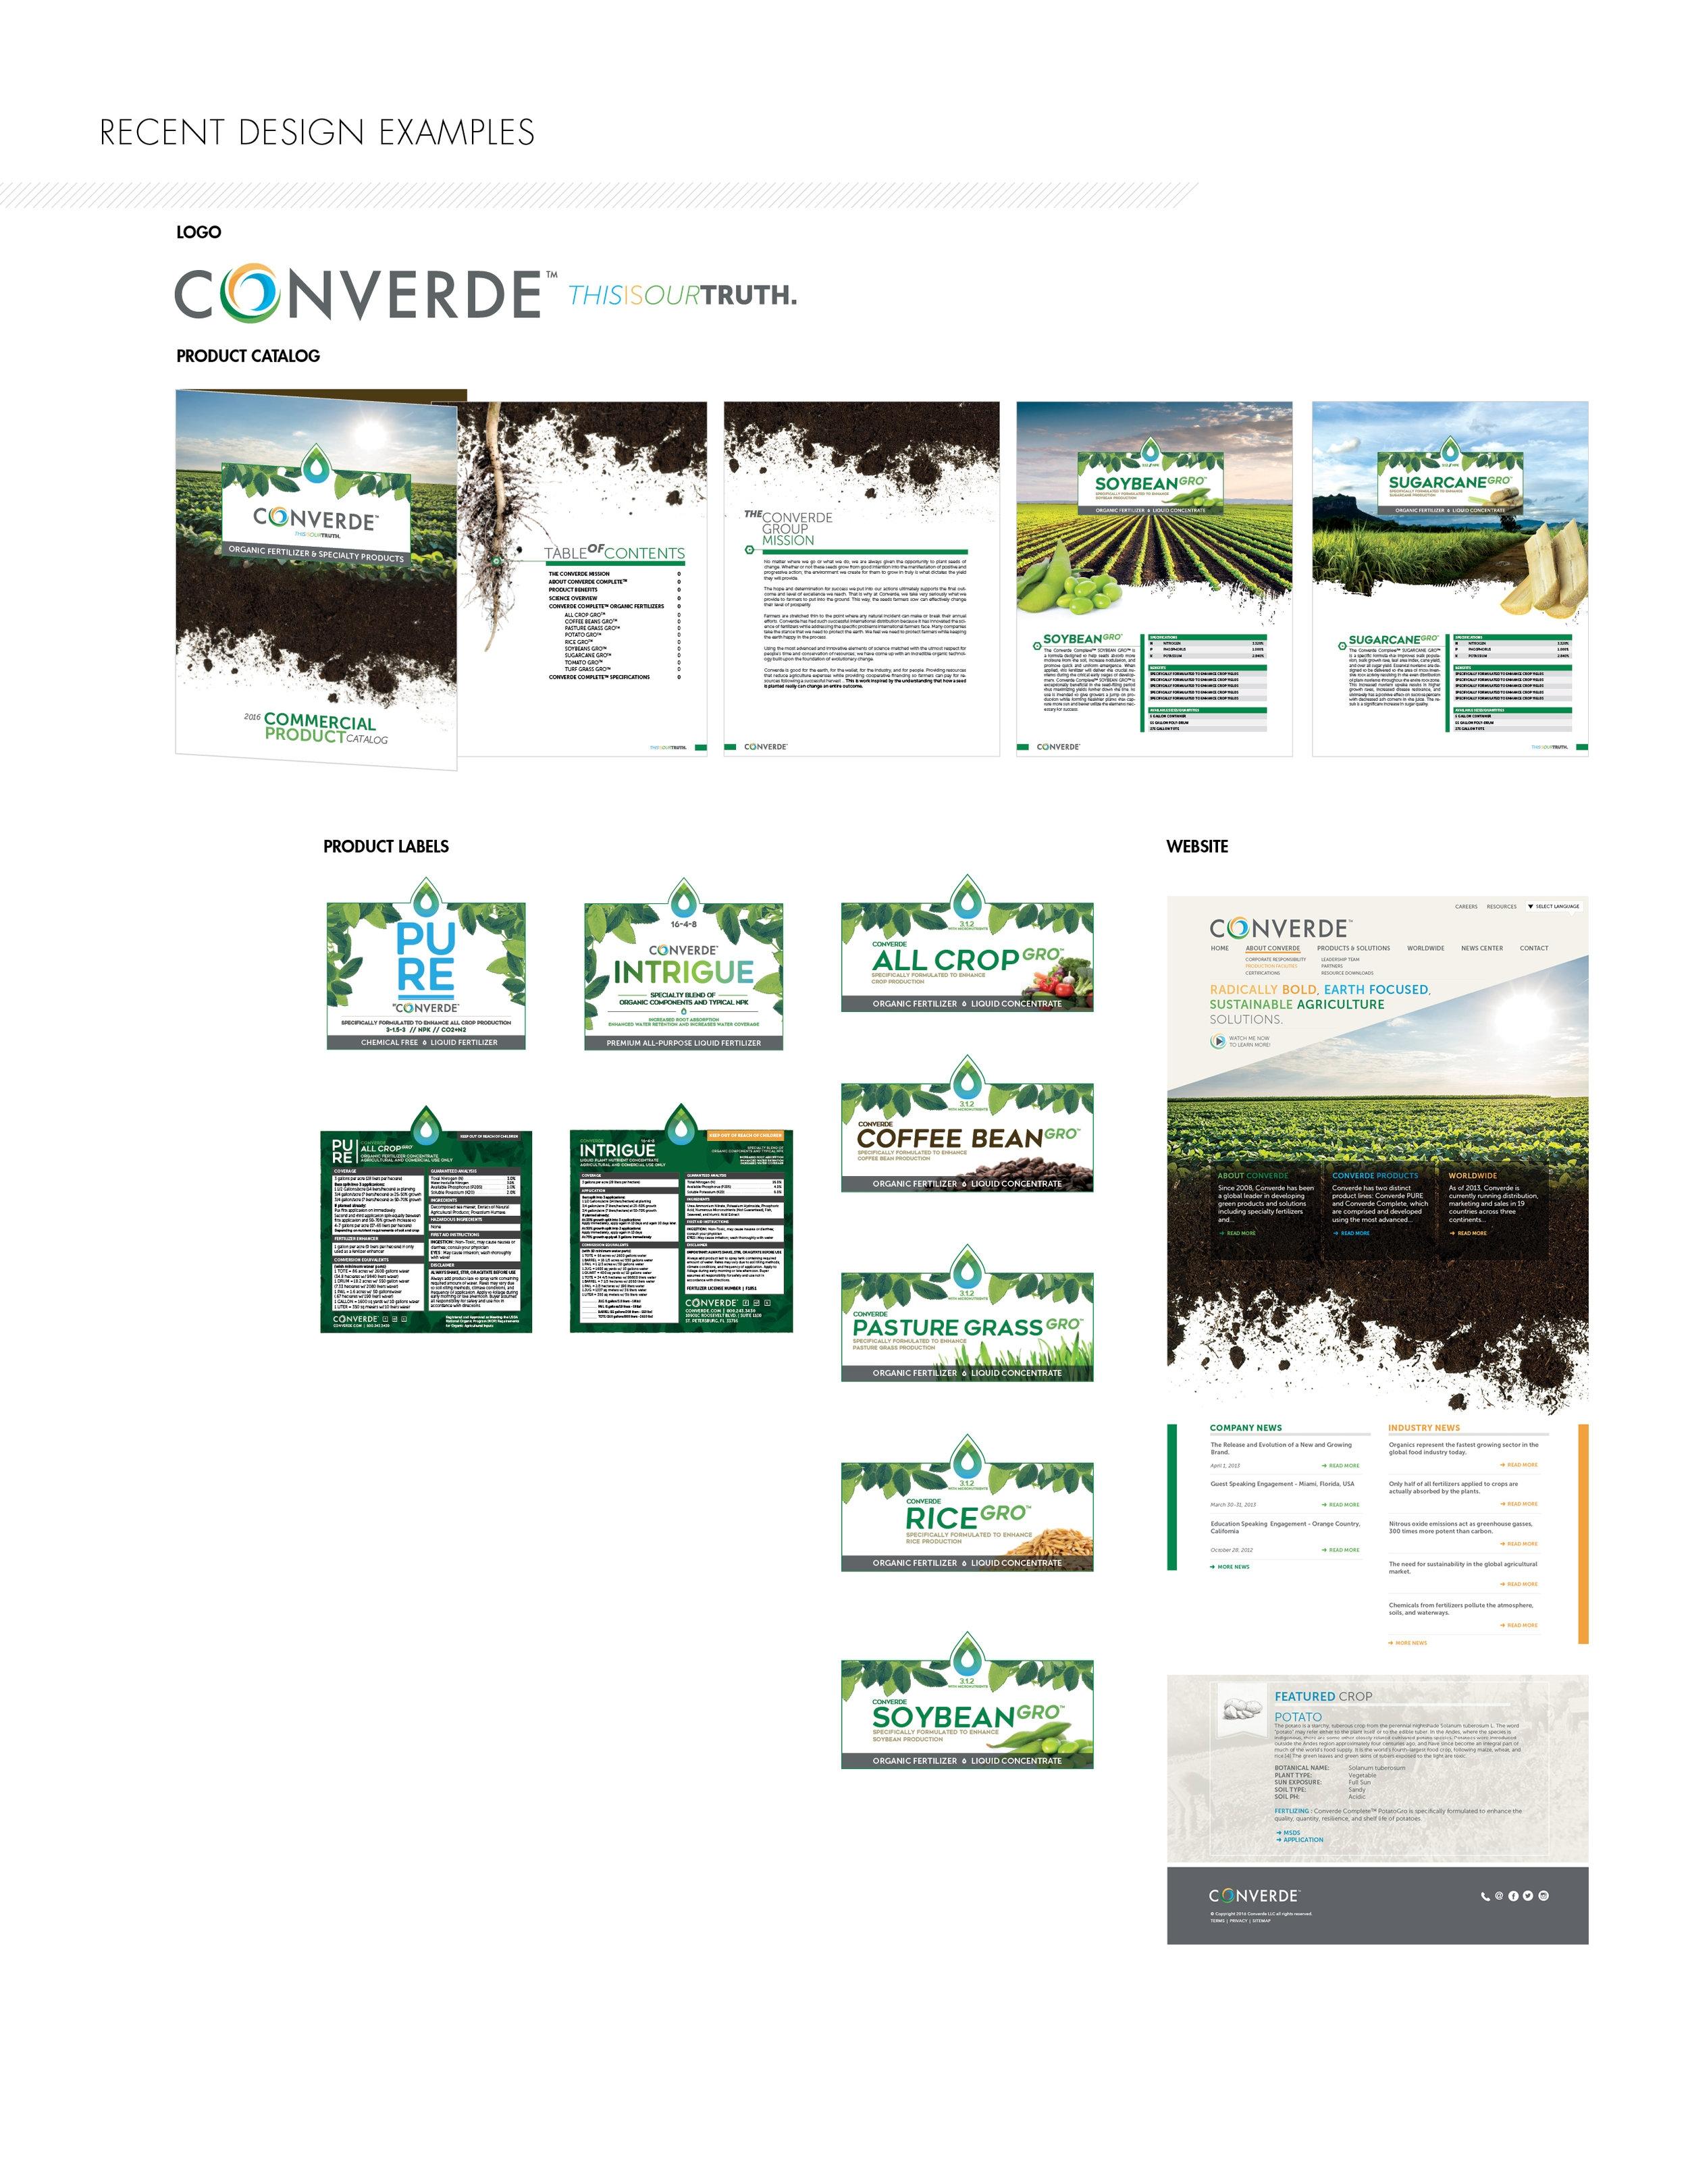 Converde Designs